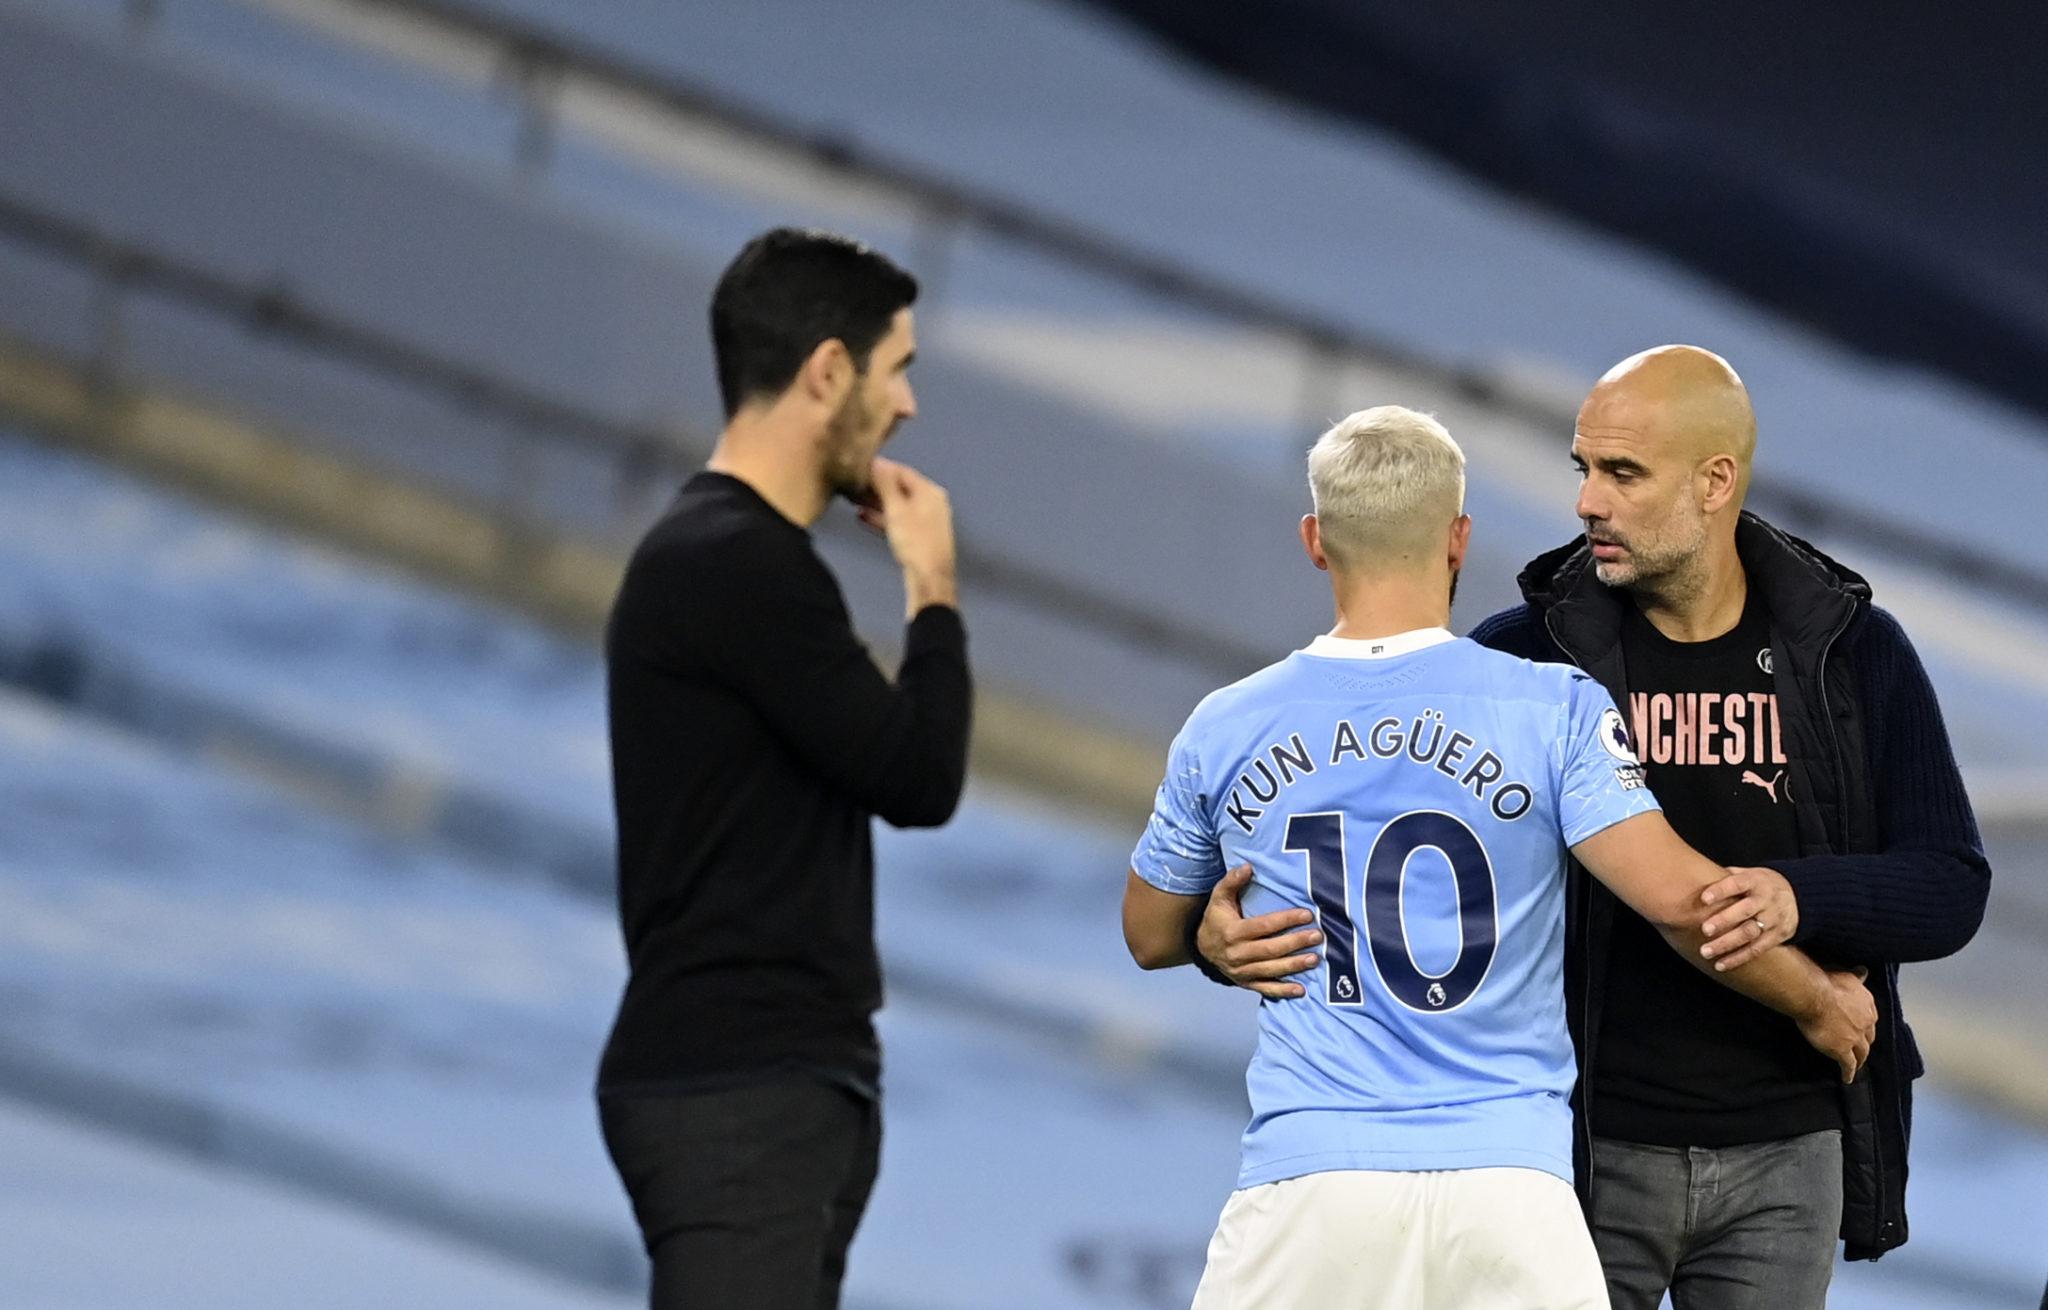 Pep Guardiola and Sergio Aguero of Manchester City.